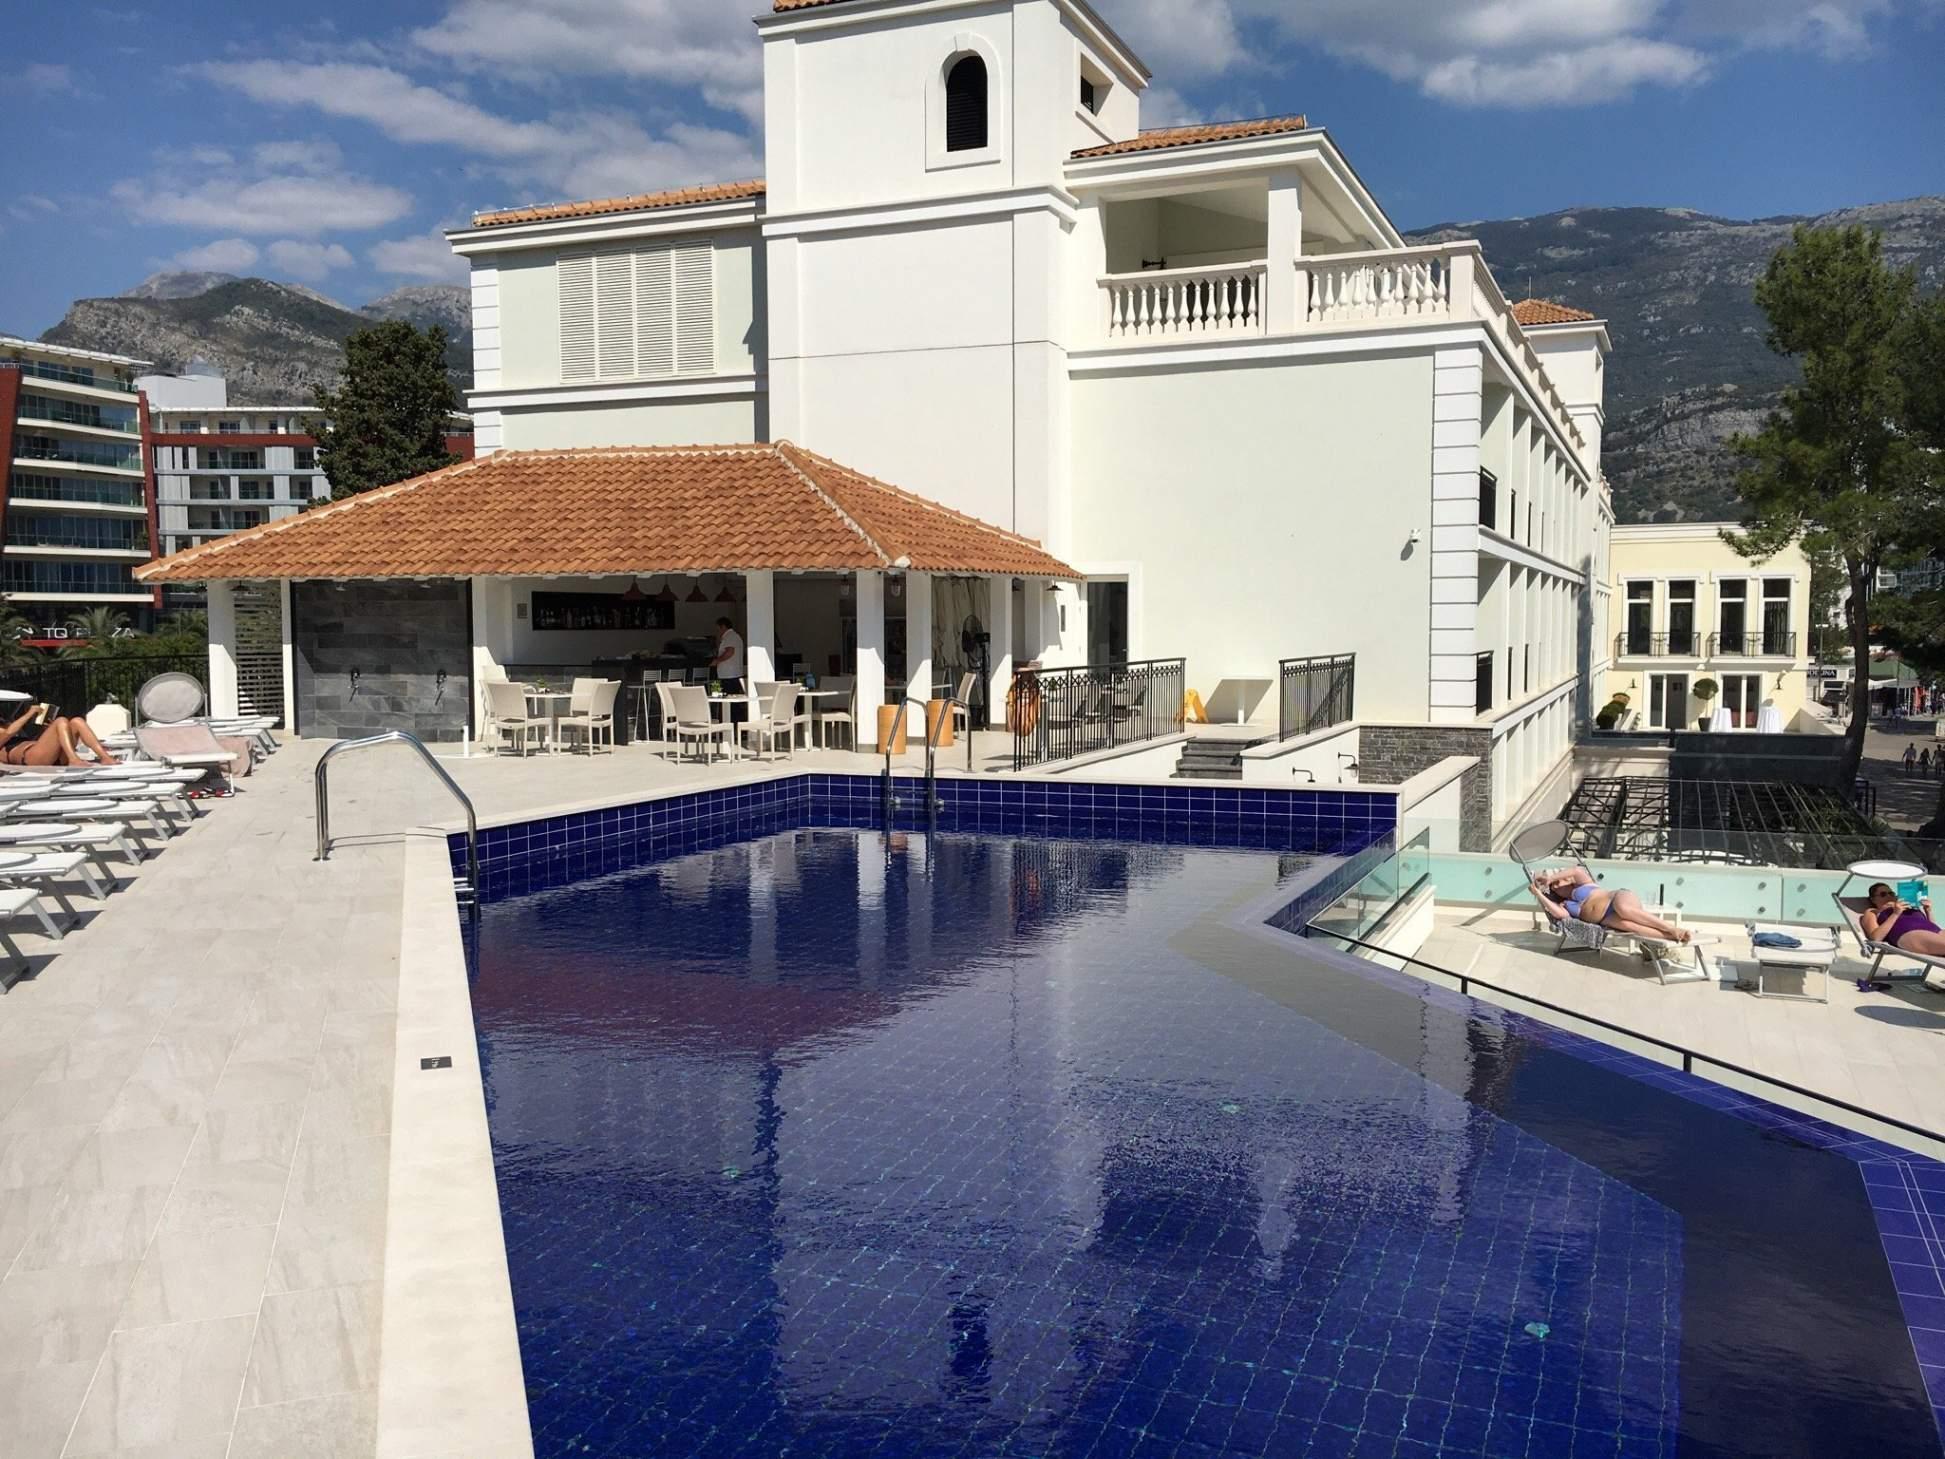 the 10 best budva hotels with a pool of 2019 with prices tripadvisor bad und pool wildau bad und pool wildau